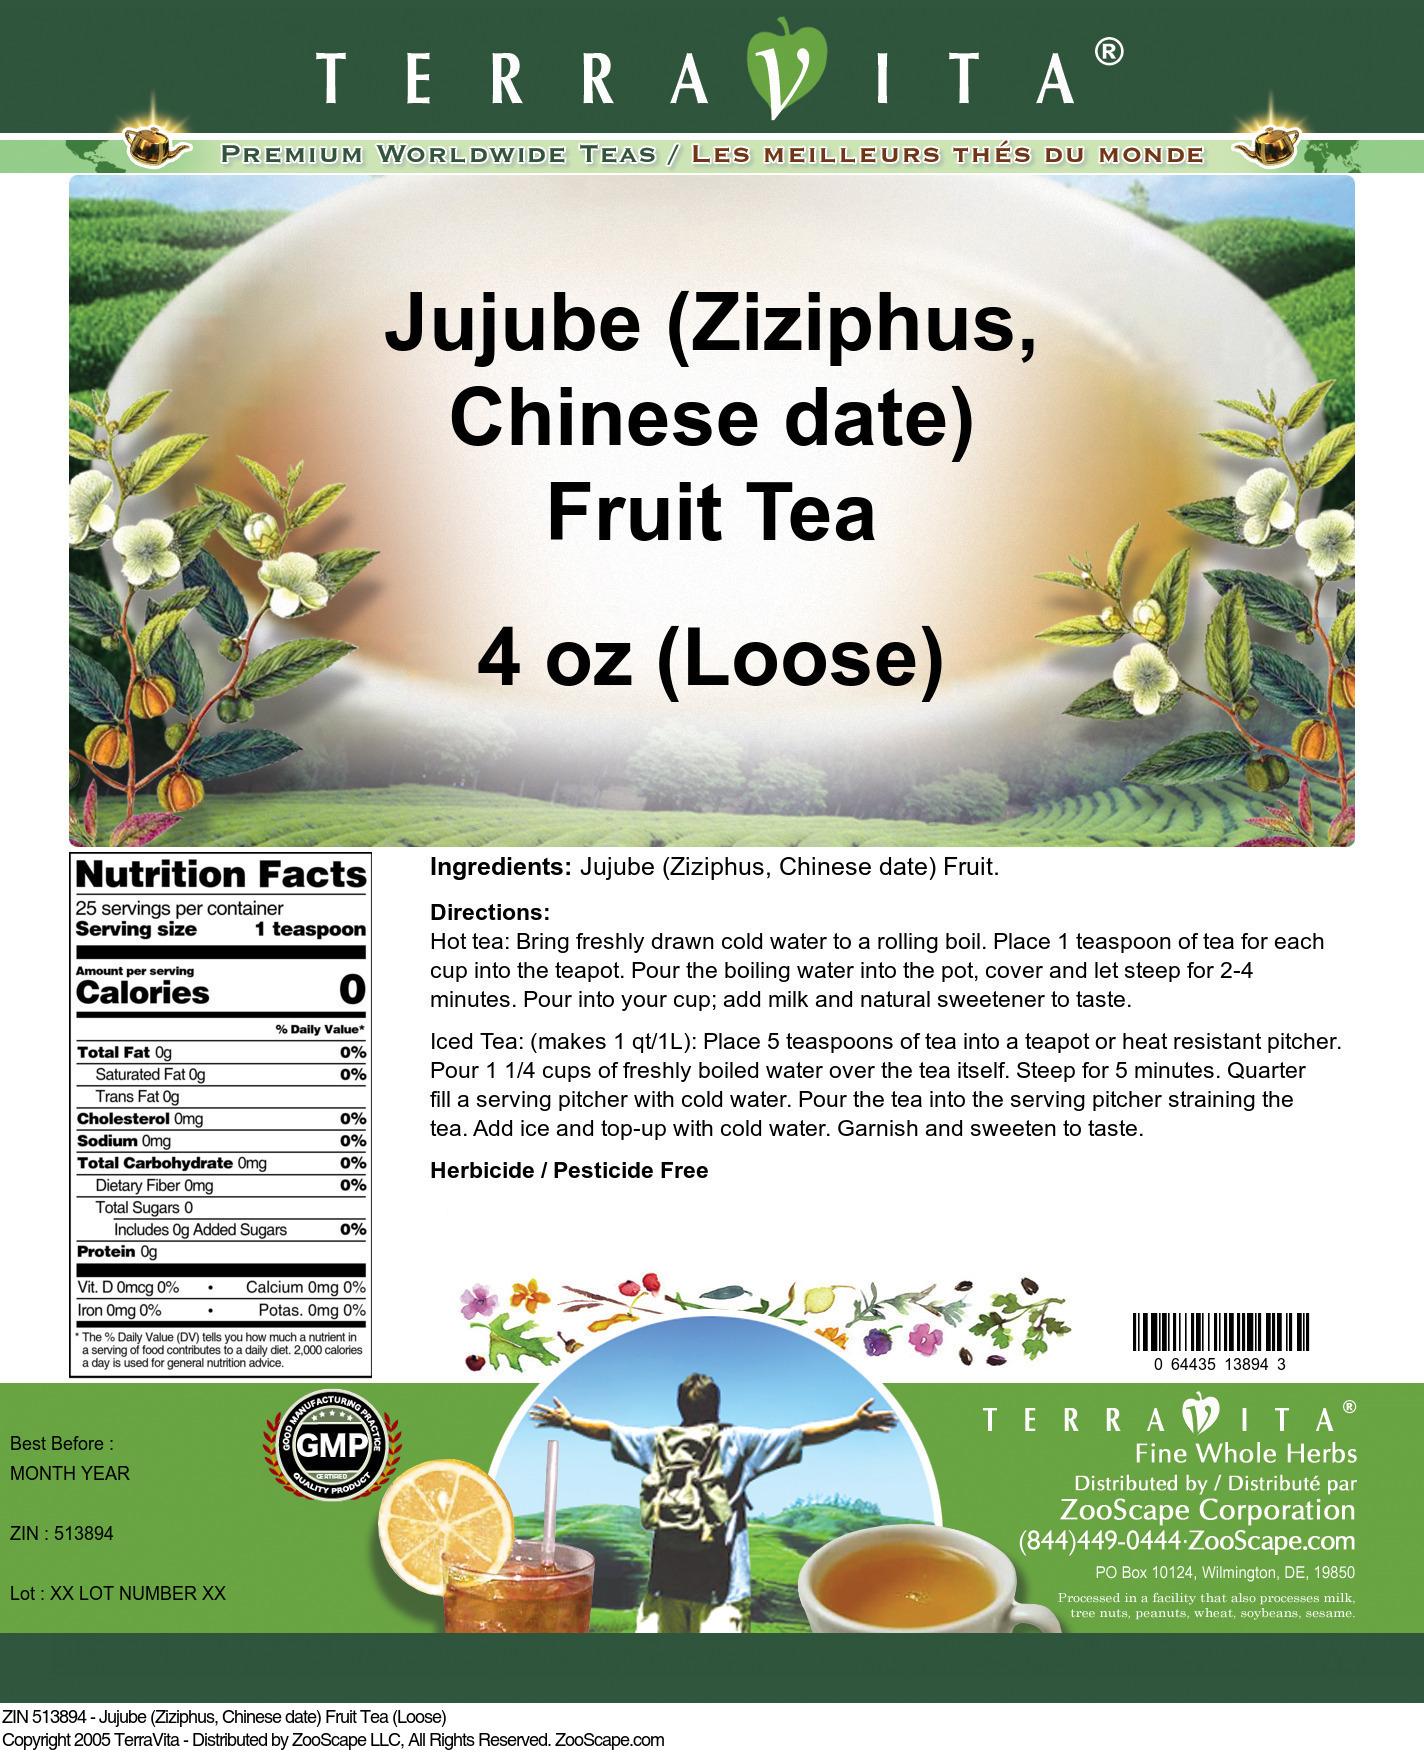 Jujube (Ziziphus, Chinese date) Fruit Tea (Loose)